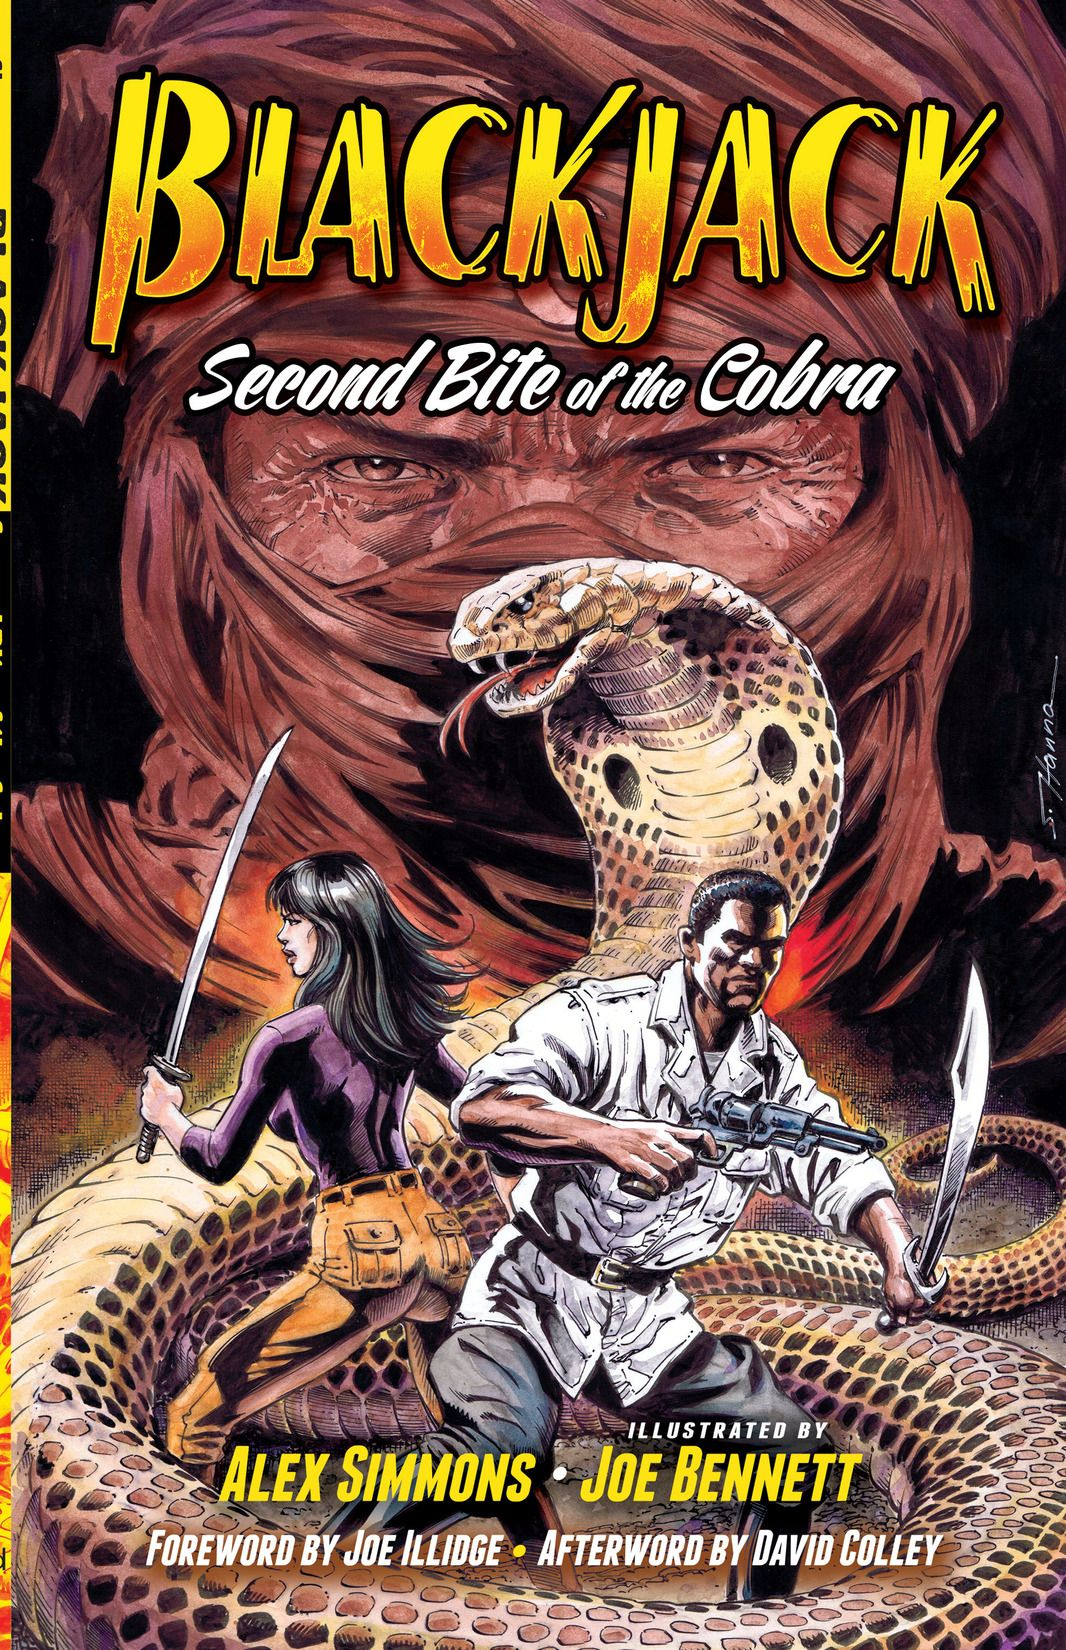 Review: Blackjack: Second Bite Of The Cobra